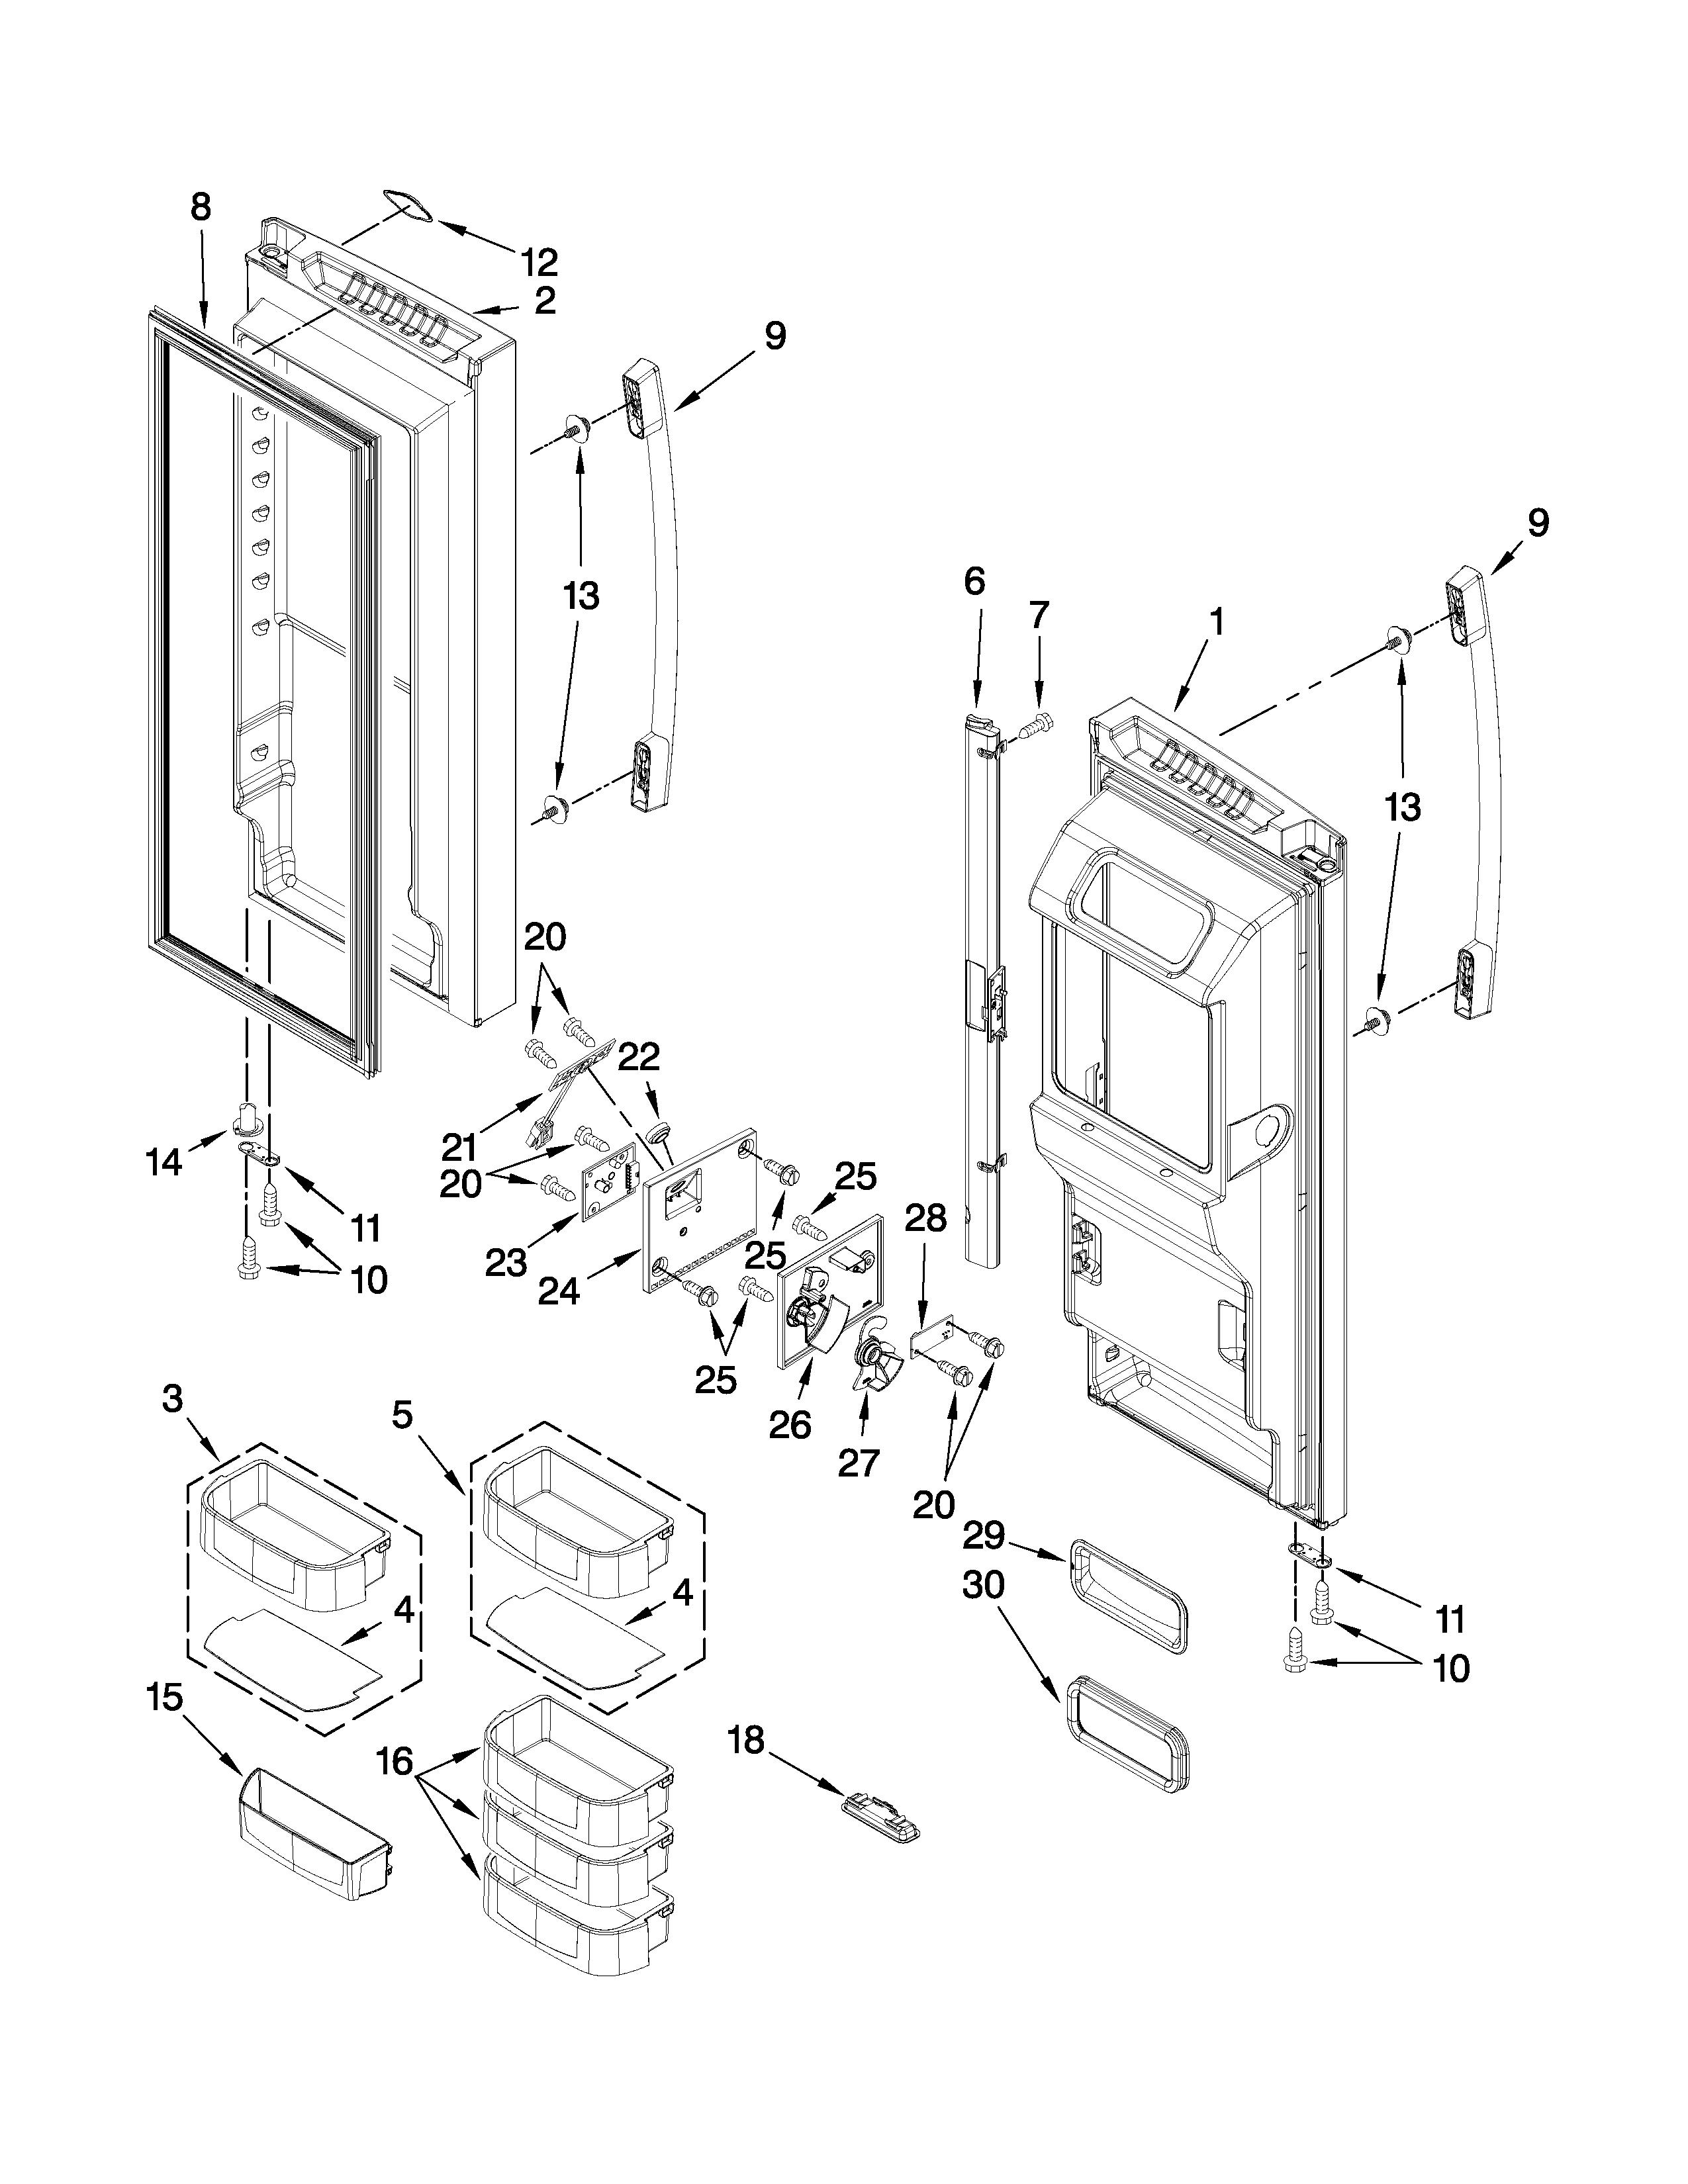 AR_3849] Whirlpool Gold Refrigerator Parts Diagram Wiring DiagramStre Sheox Mohammedshrine Librar Wiring 101